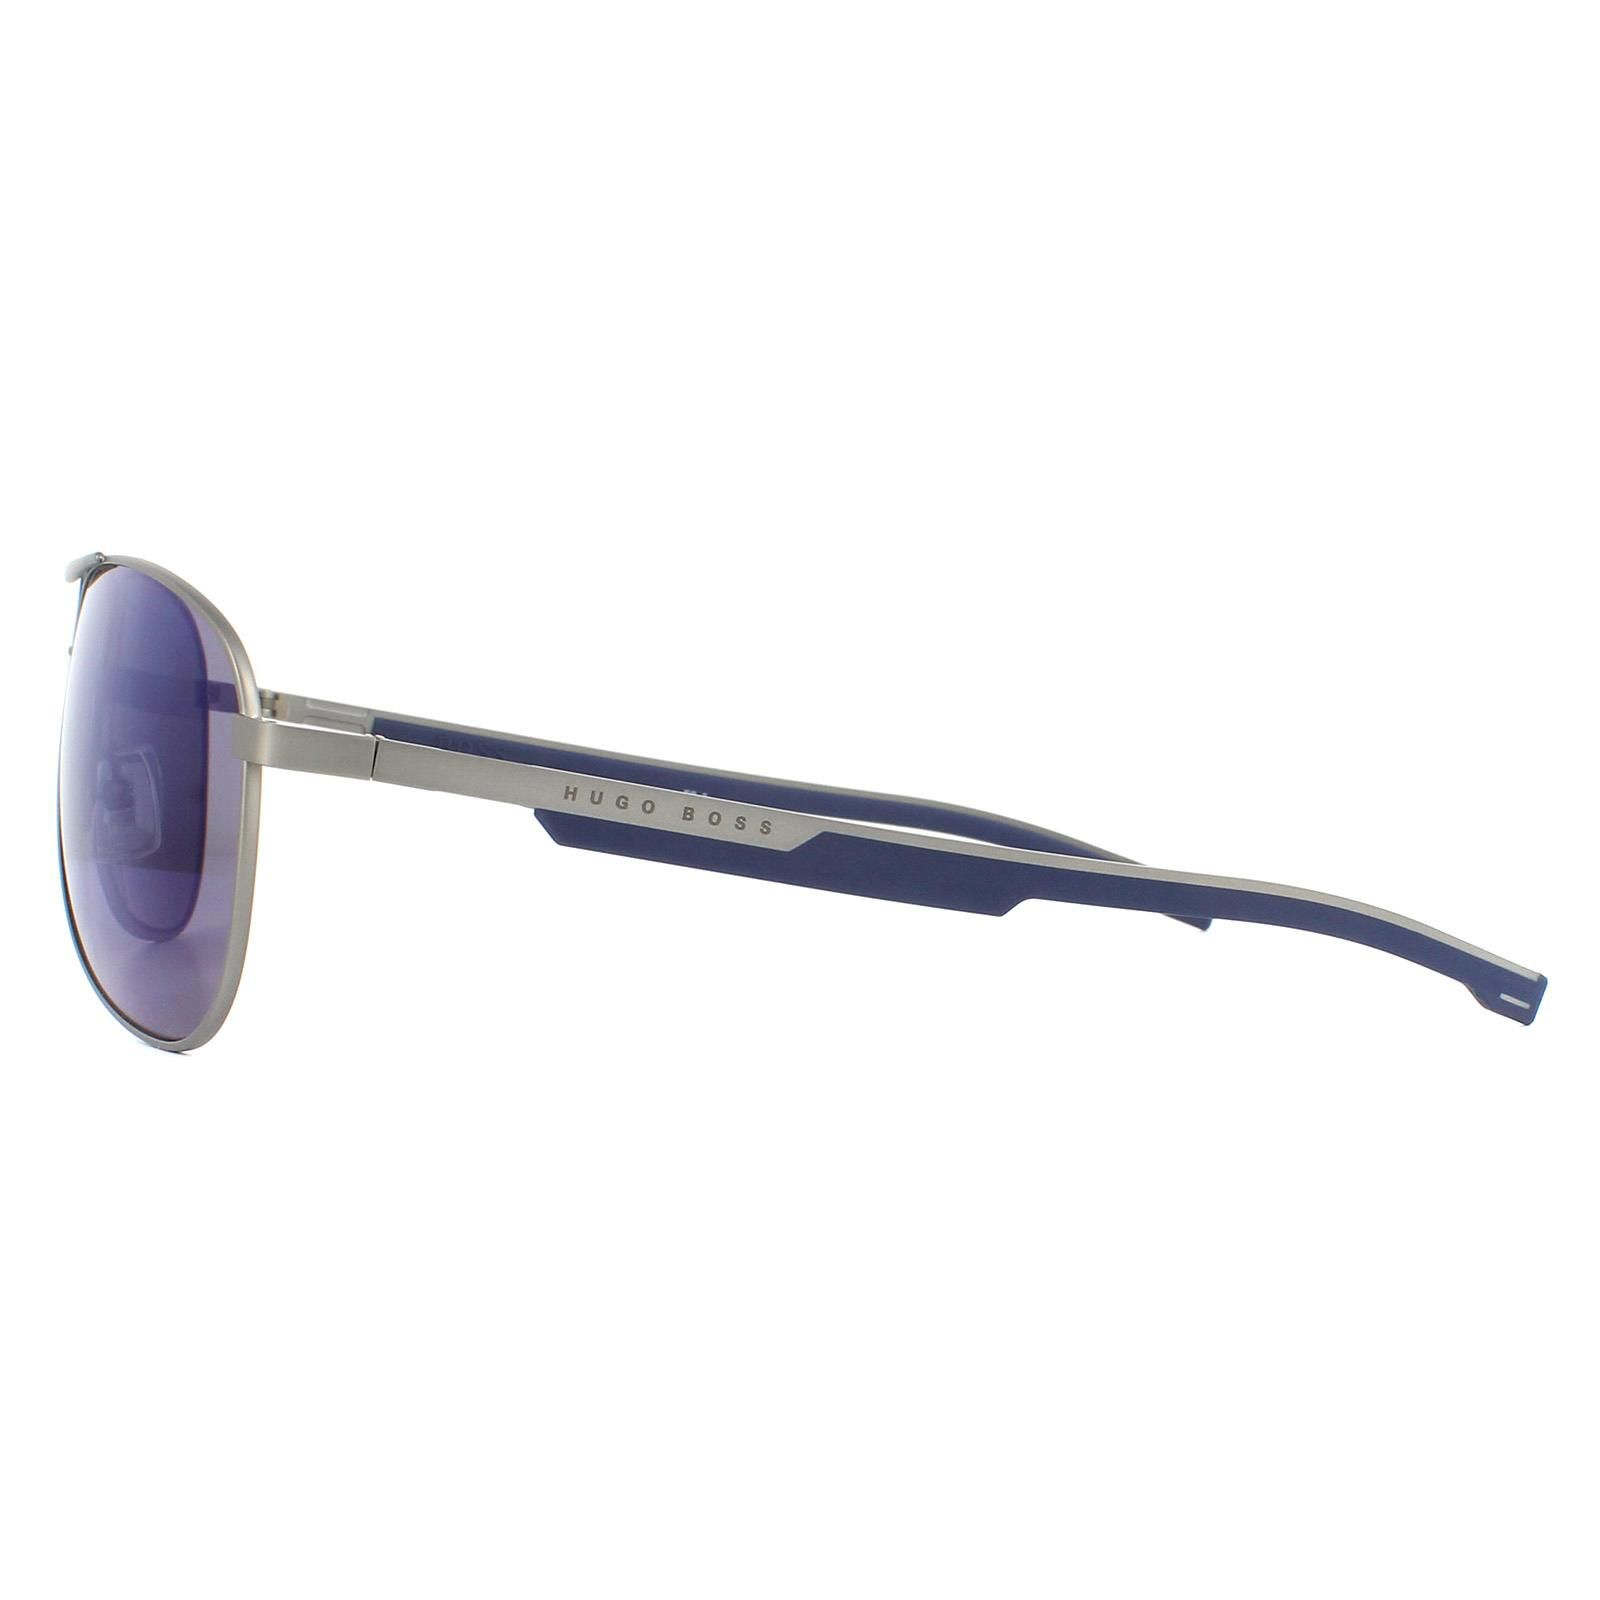 Hugo Boss Sunglasses BOSS 1199/S R81/XT Matte Ruthenium Blue Mirror